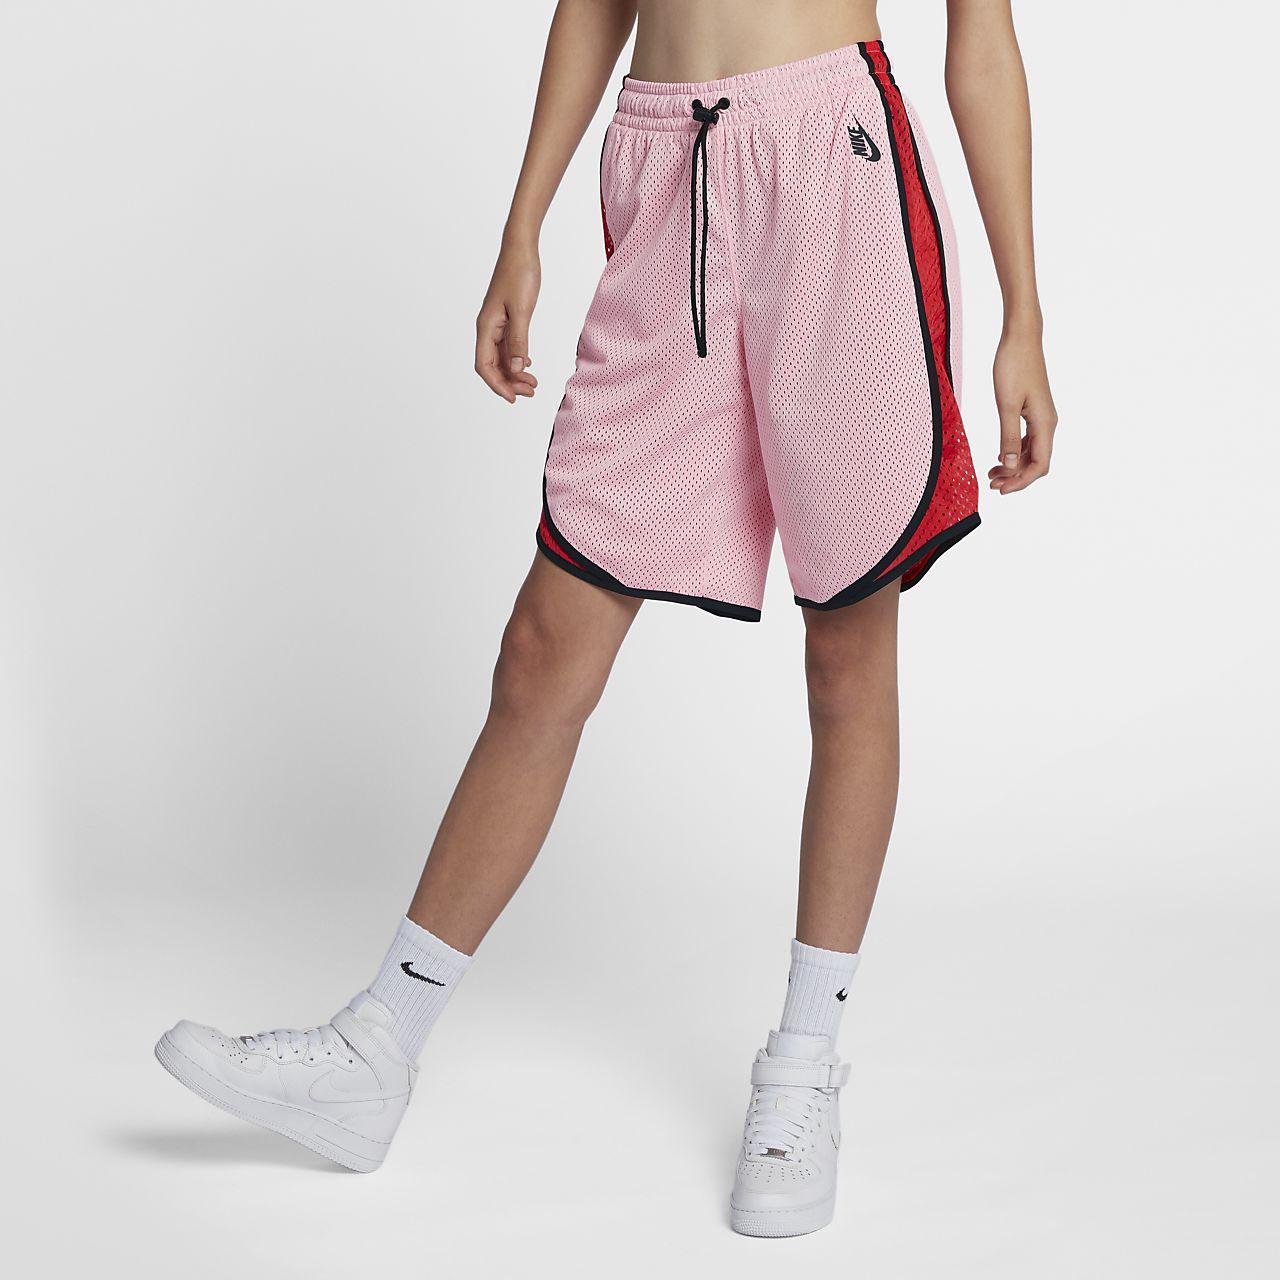 NikeLab Collection 女子短裤